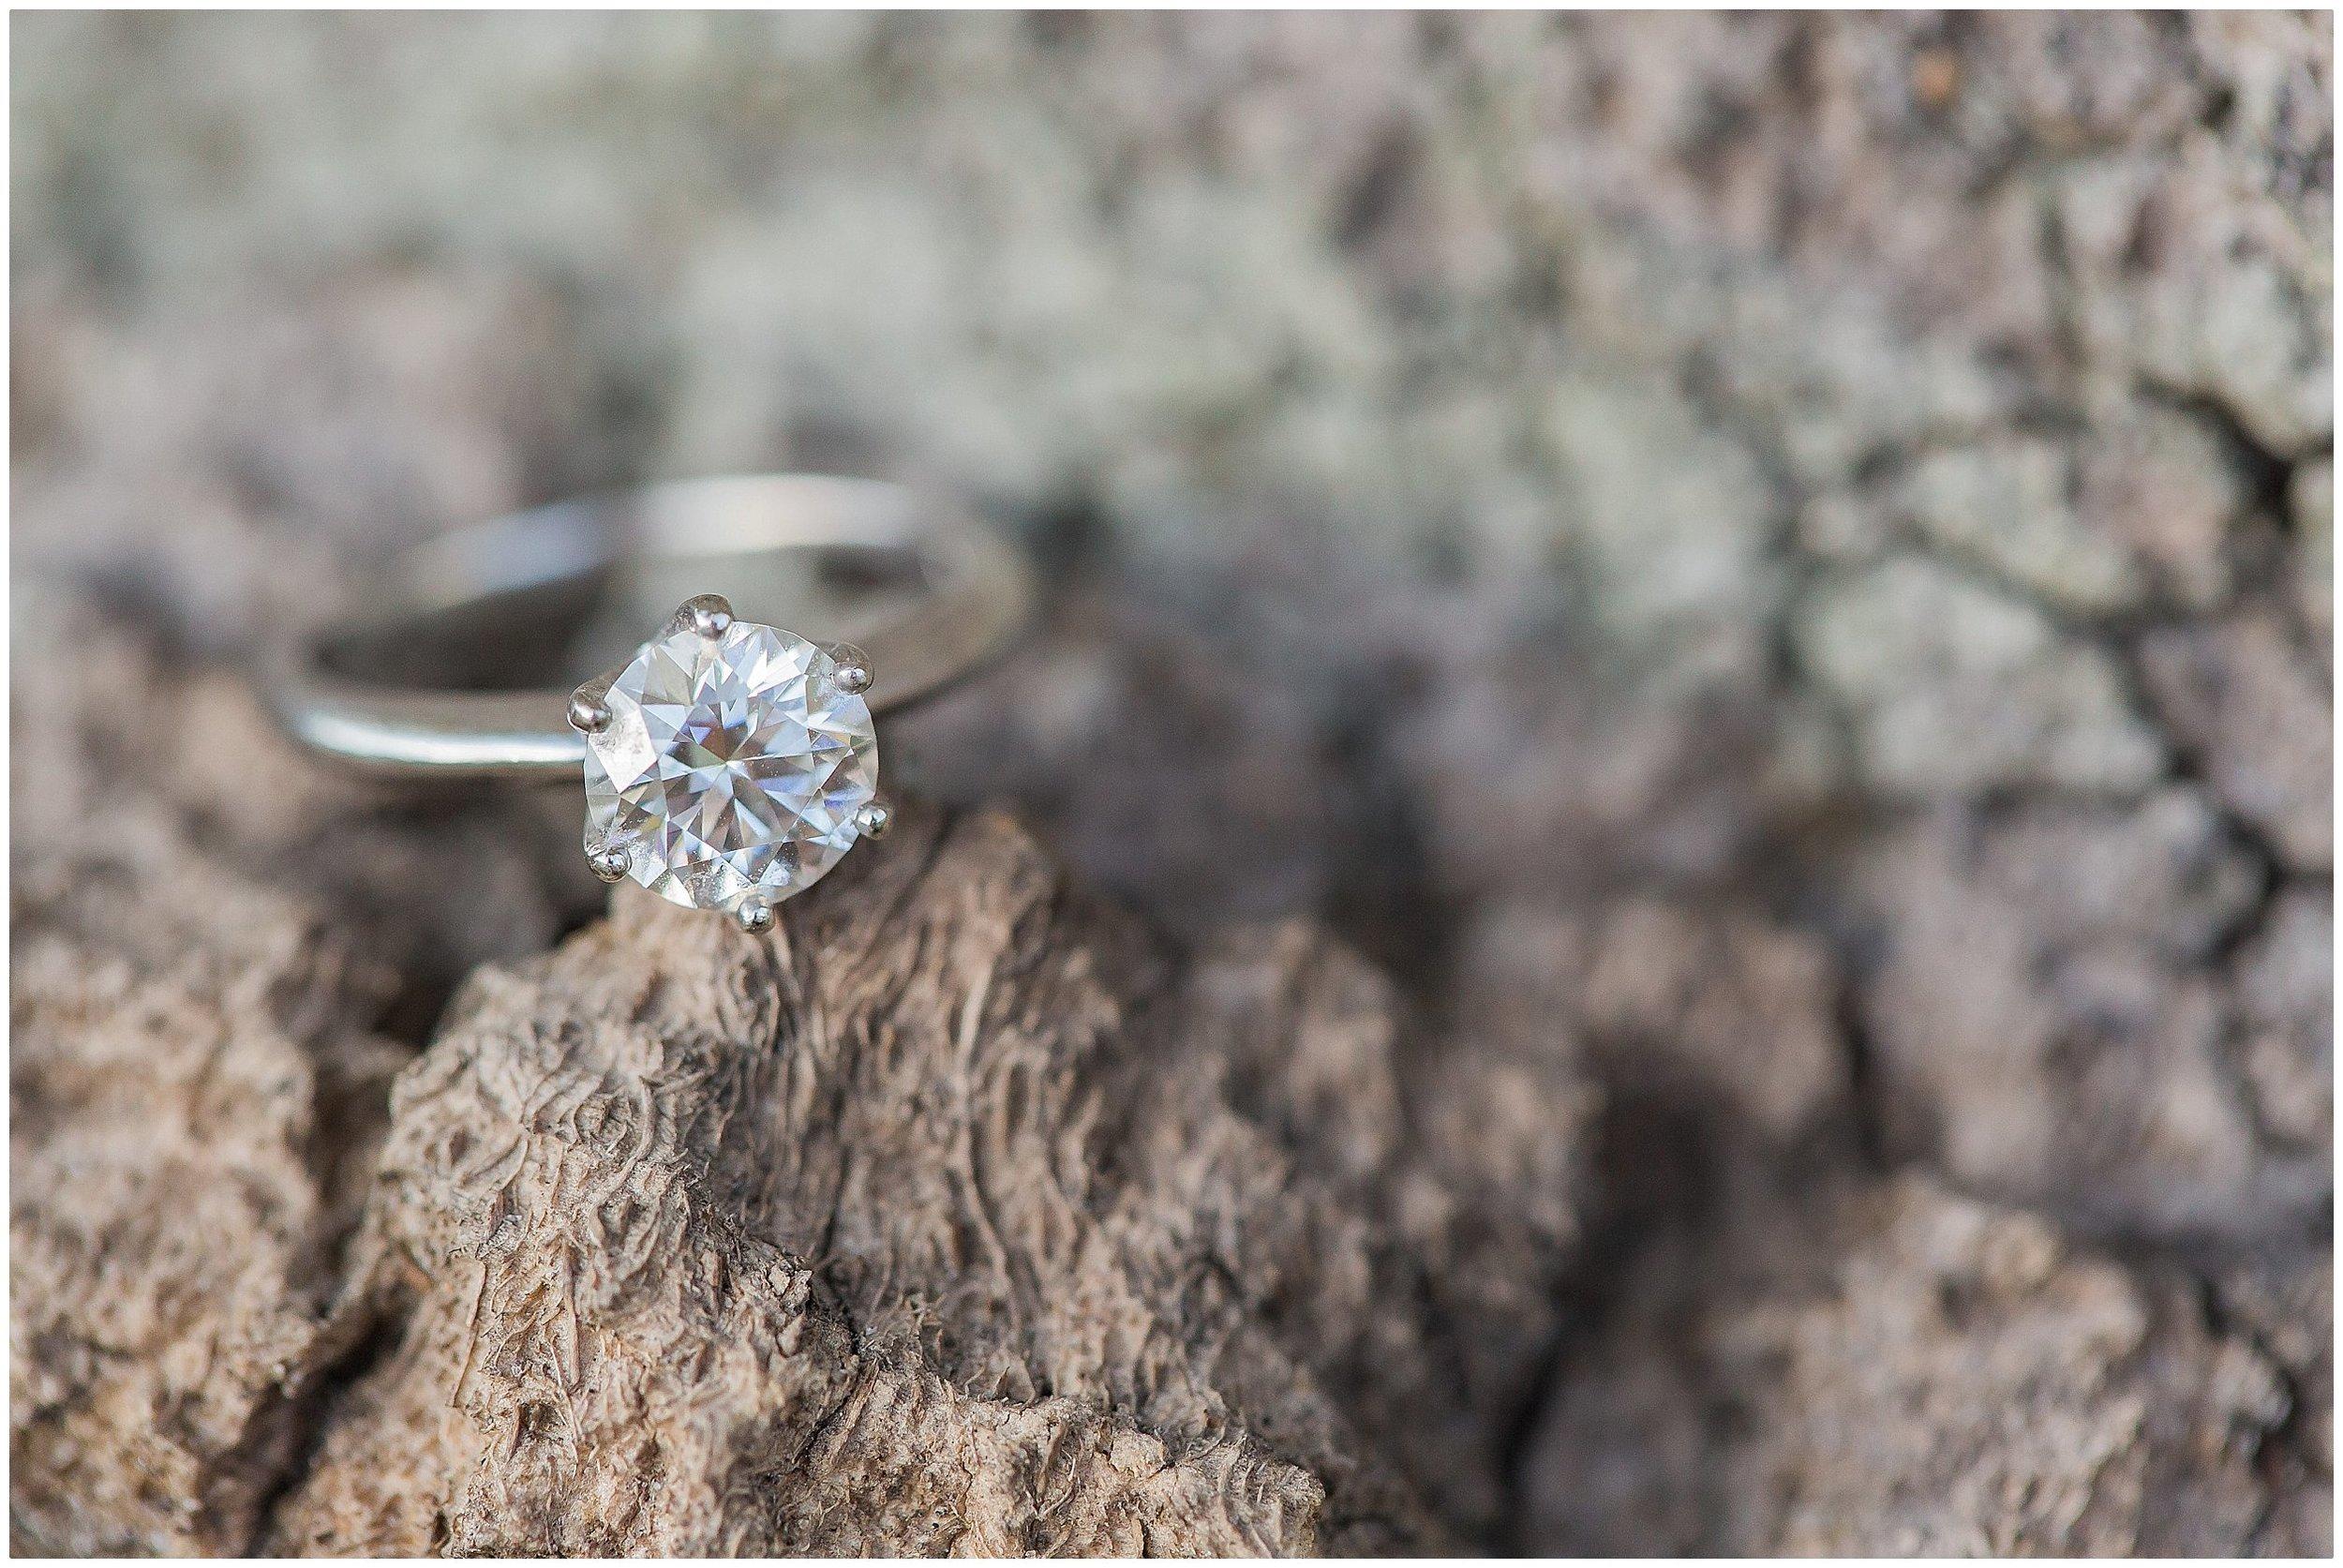 Gorgeous Ring Shot on tree branch